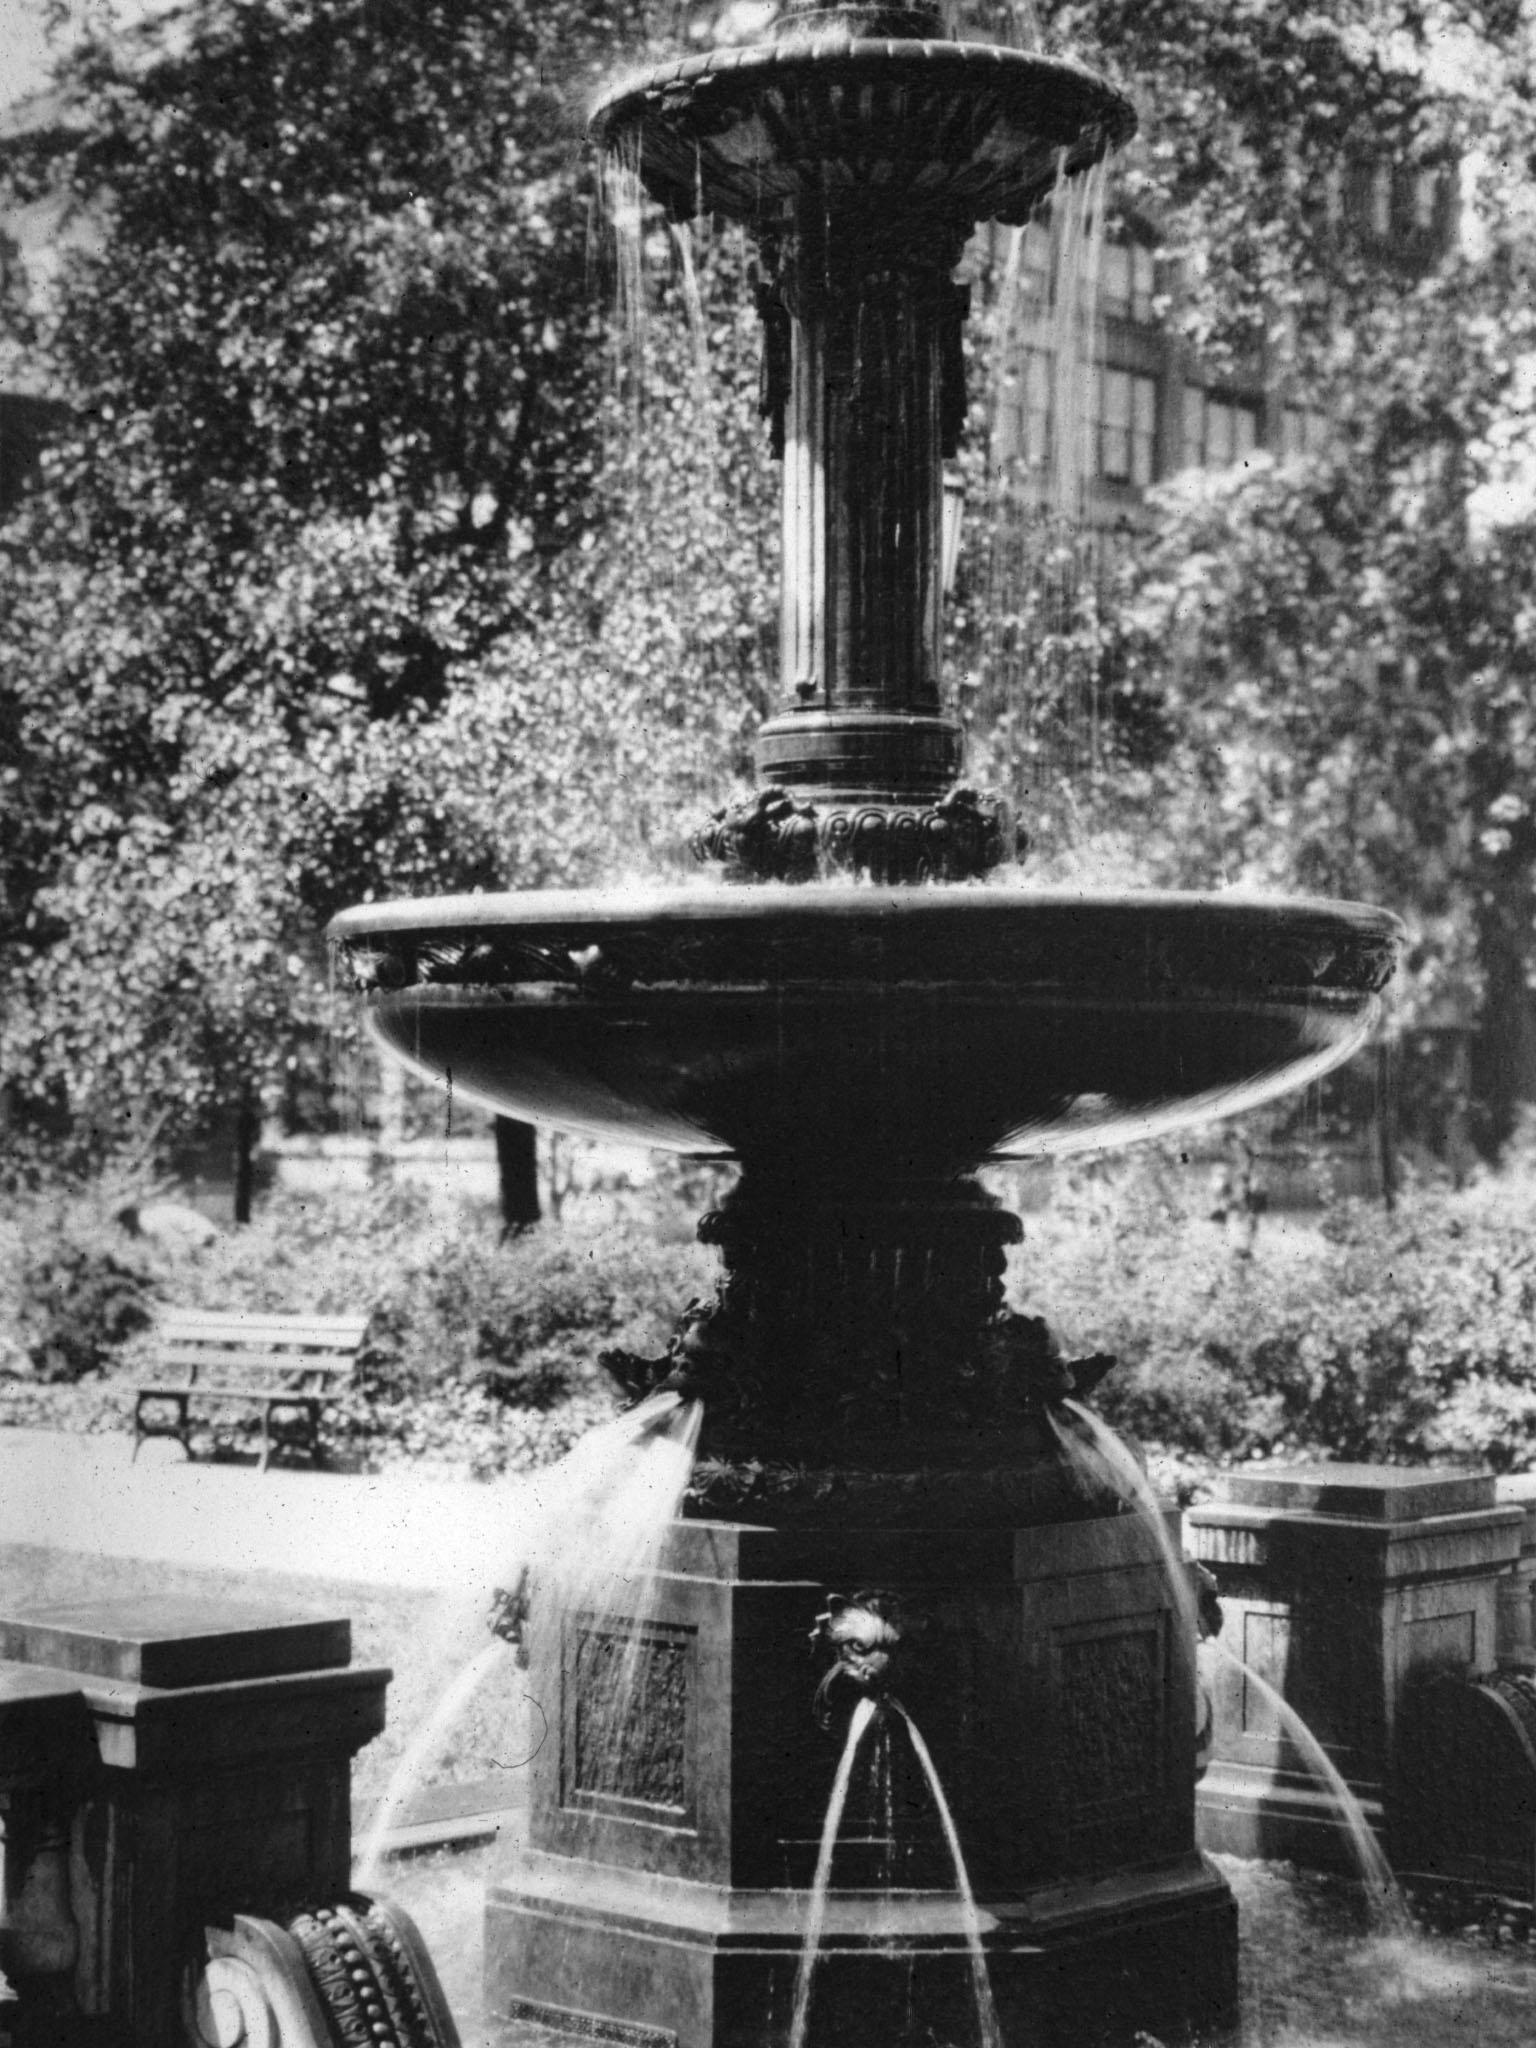 Peter Pan Fountain, Johnson Park